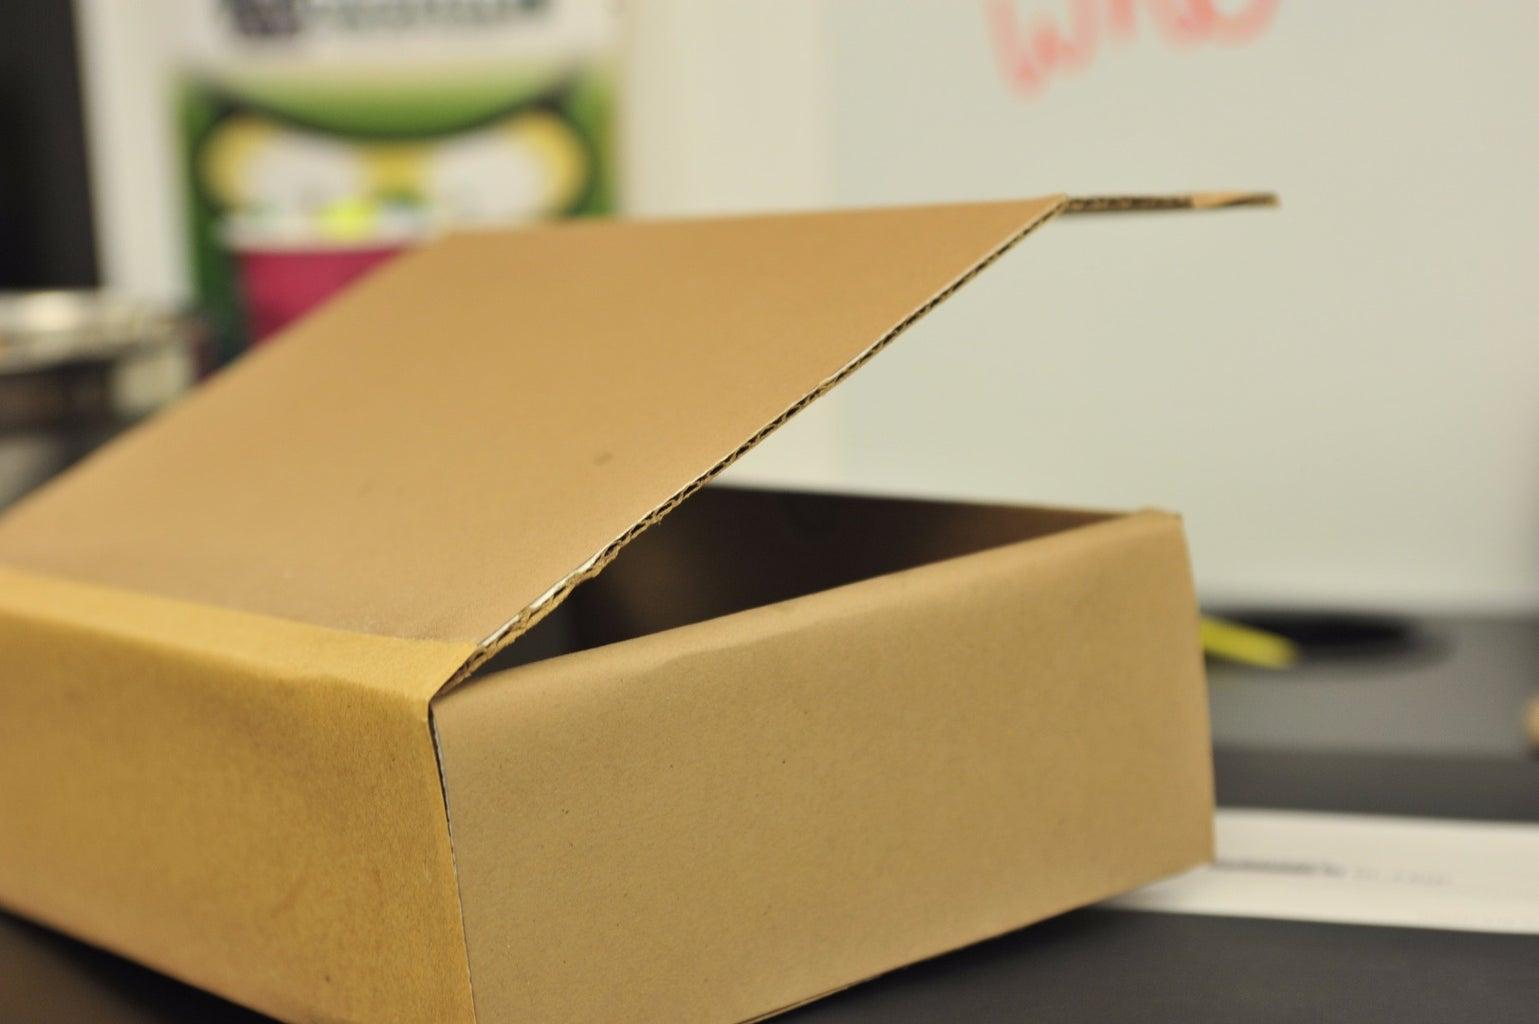 Wrap the Box